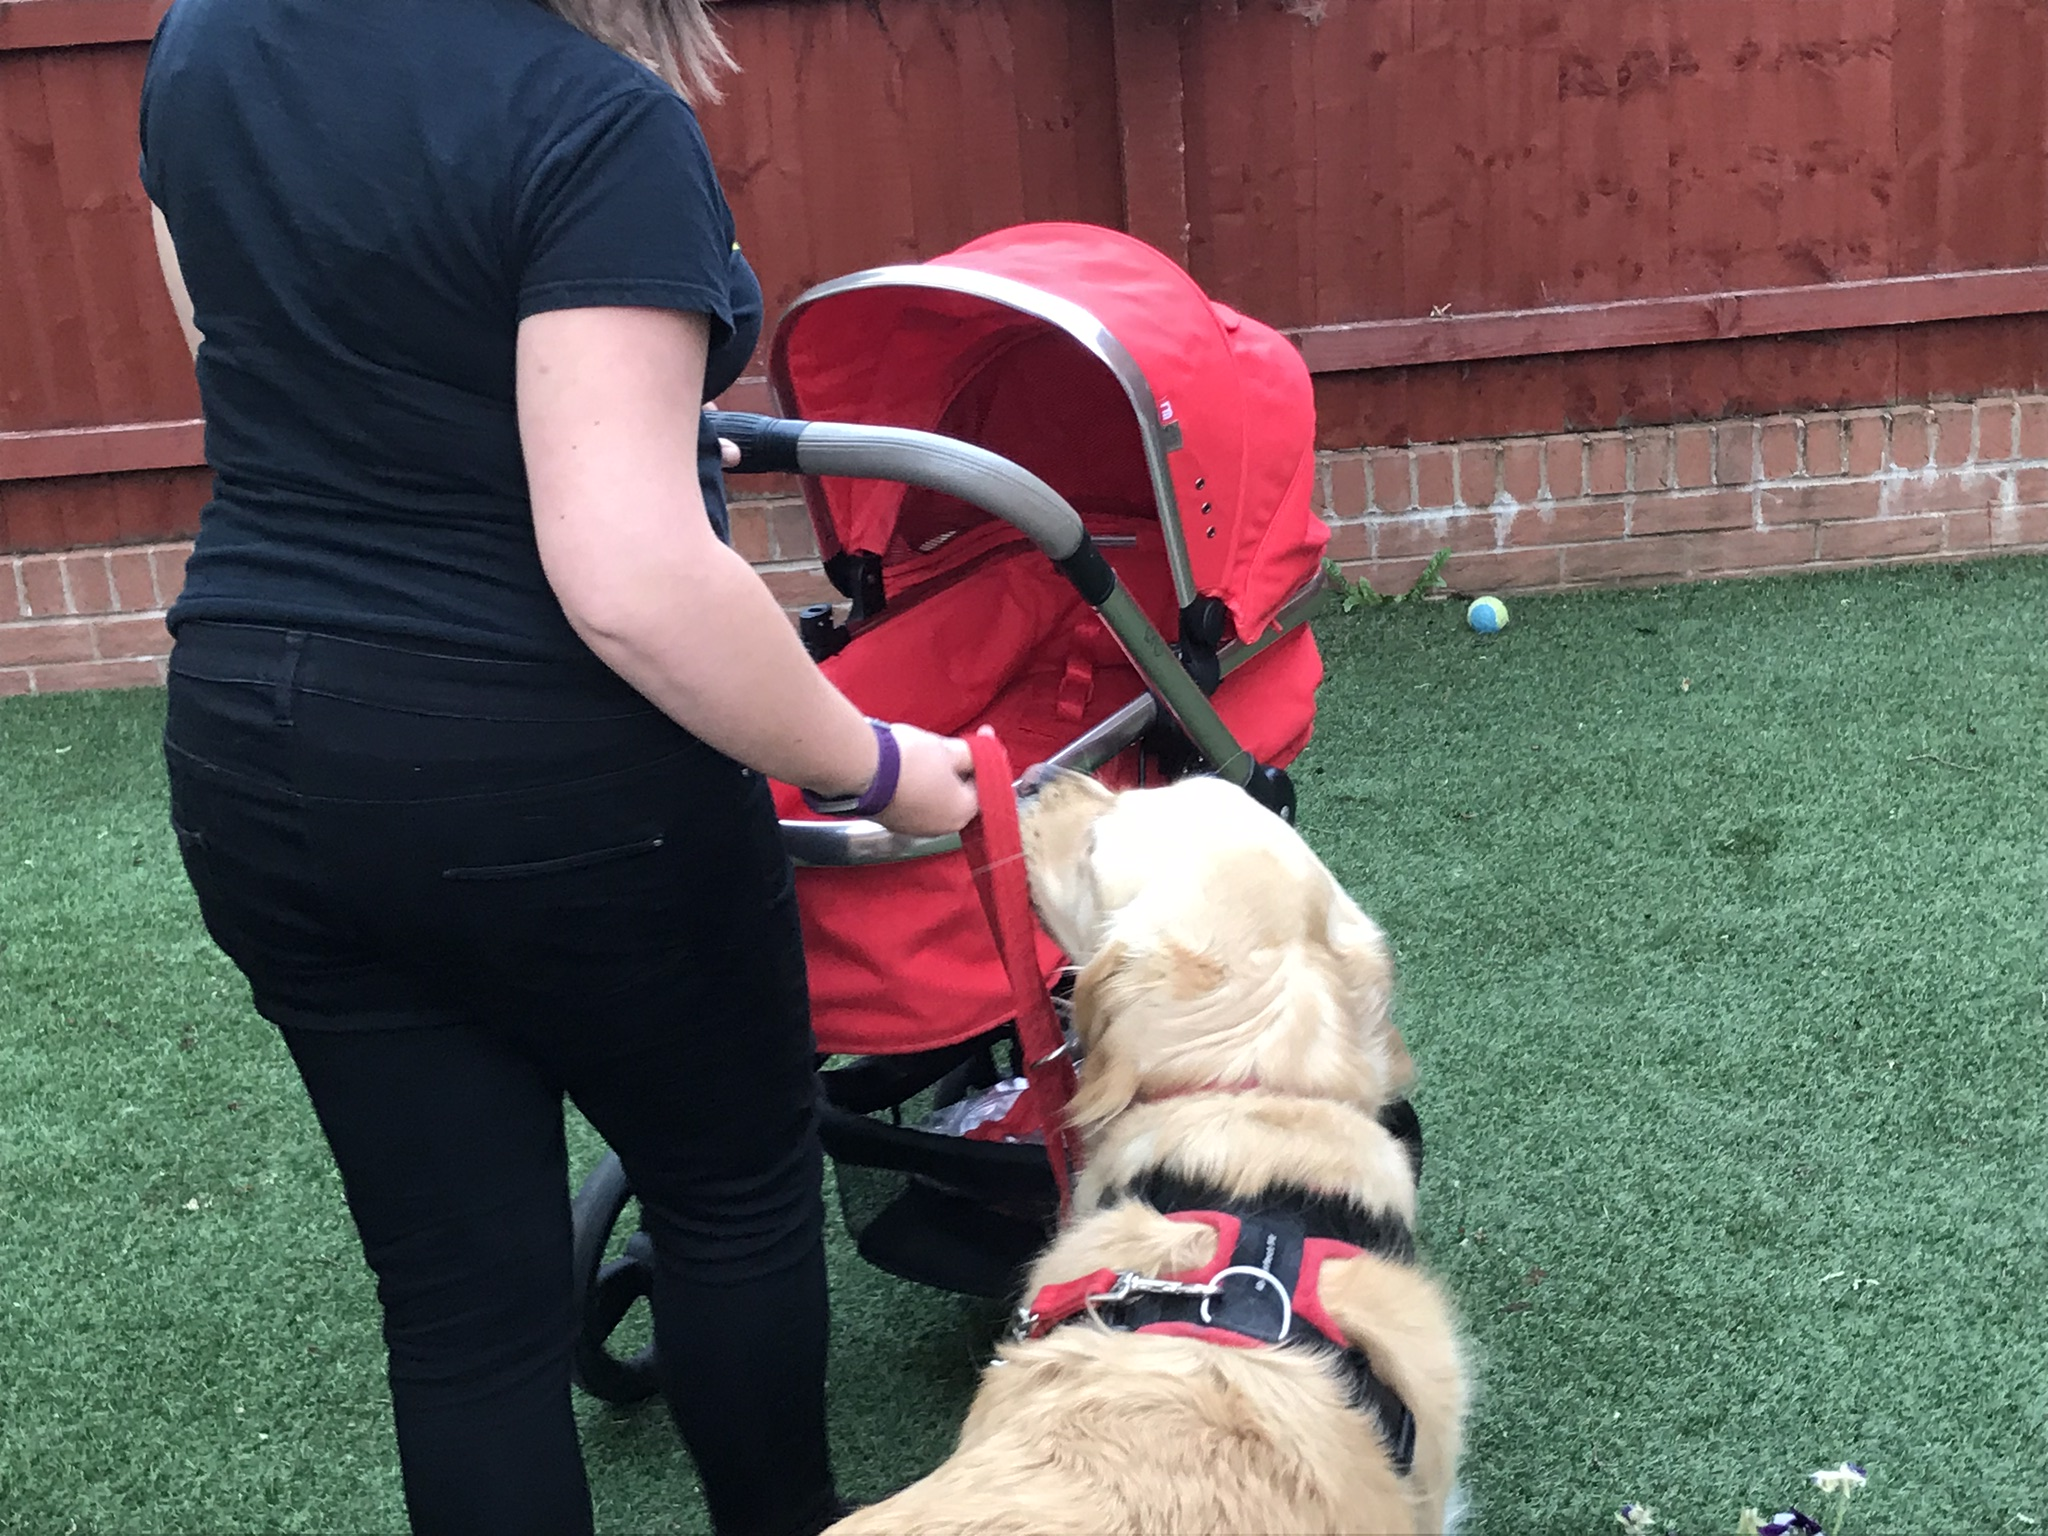 Training to walk with the pram